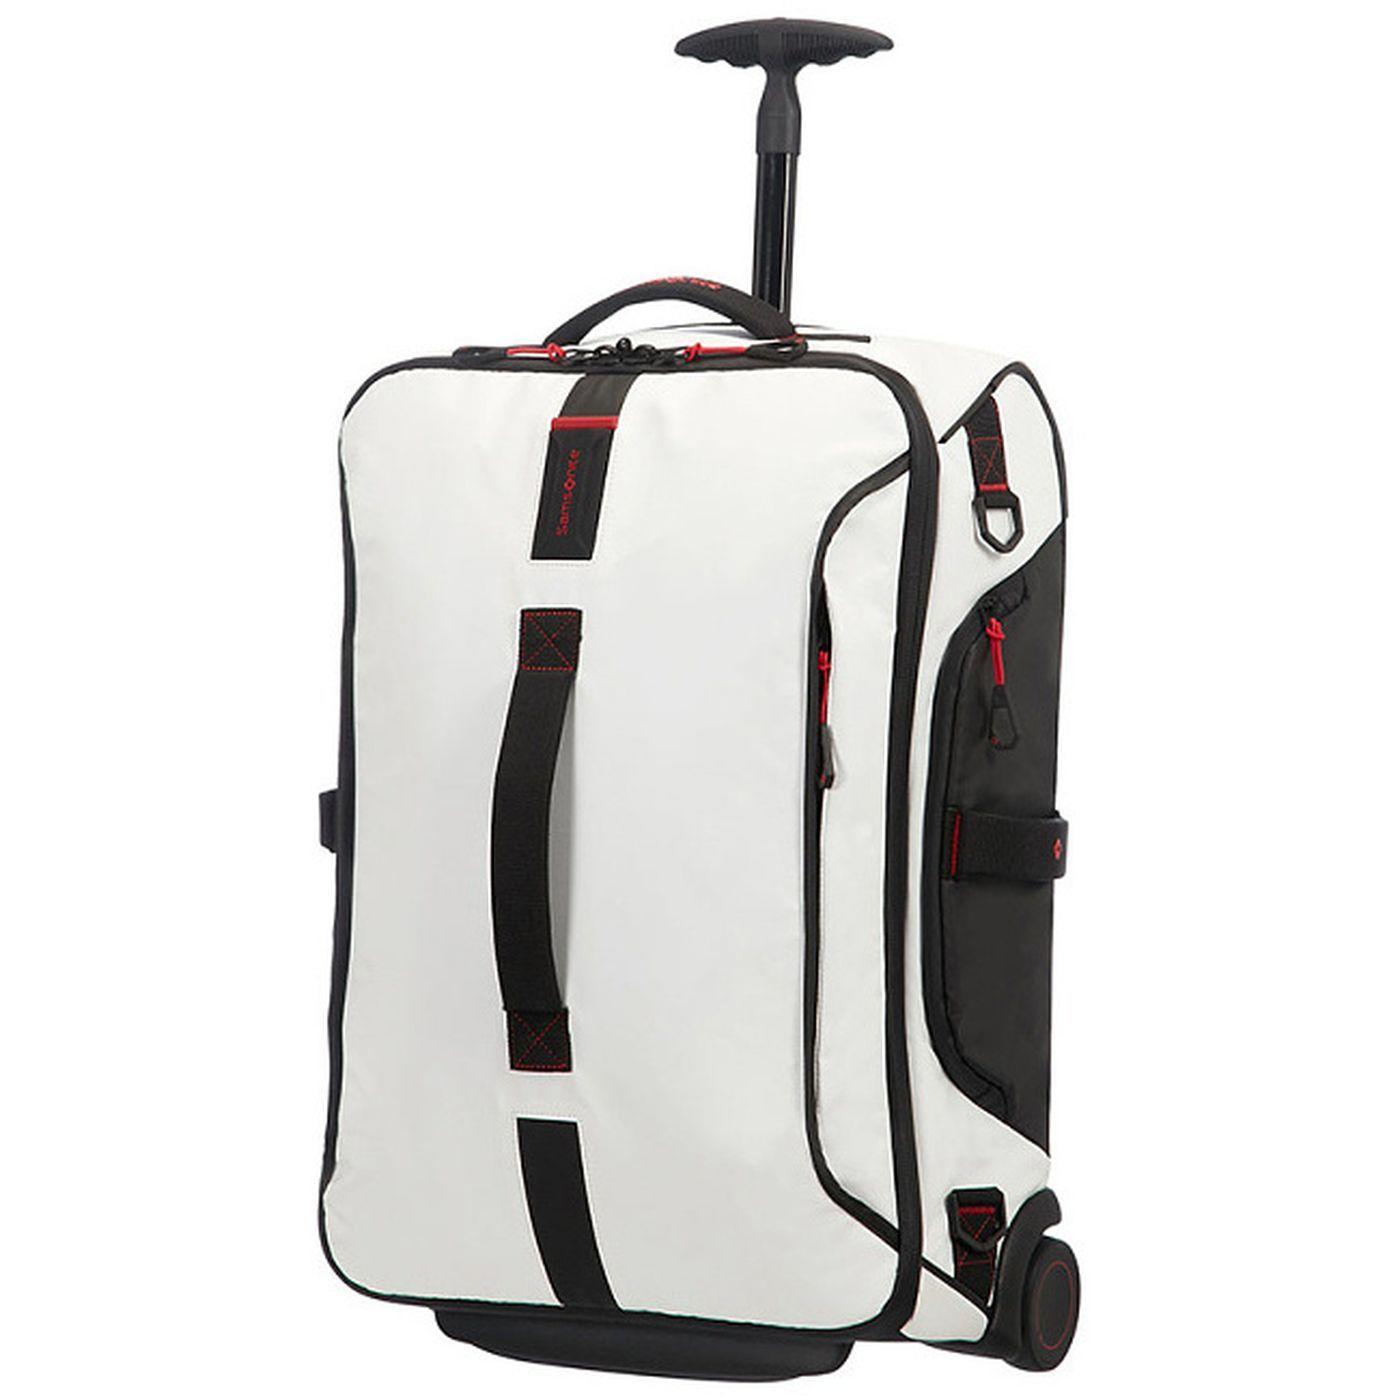 d84c7c19c1e Cestovná taška Samsonite Paradiver Light Duffle wh 55 01N 007 - INBAG.sk